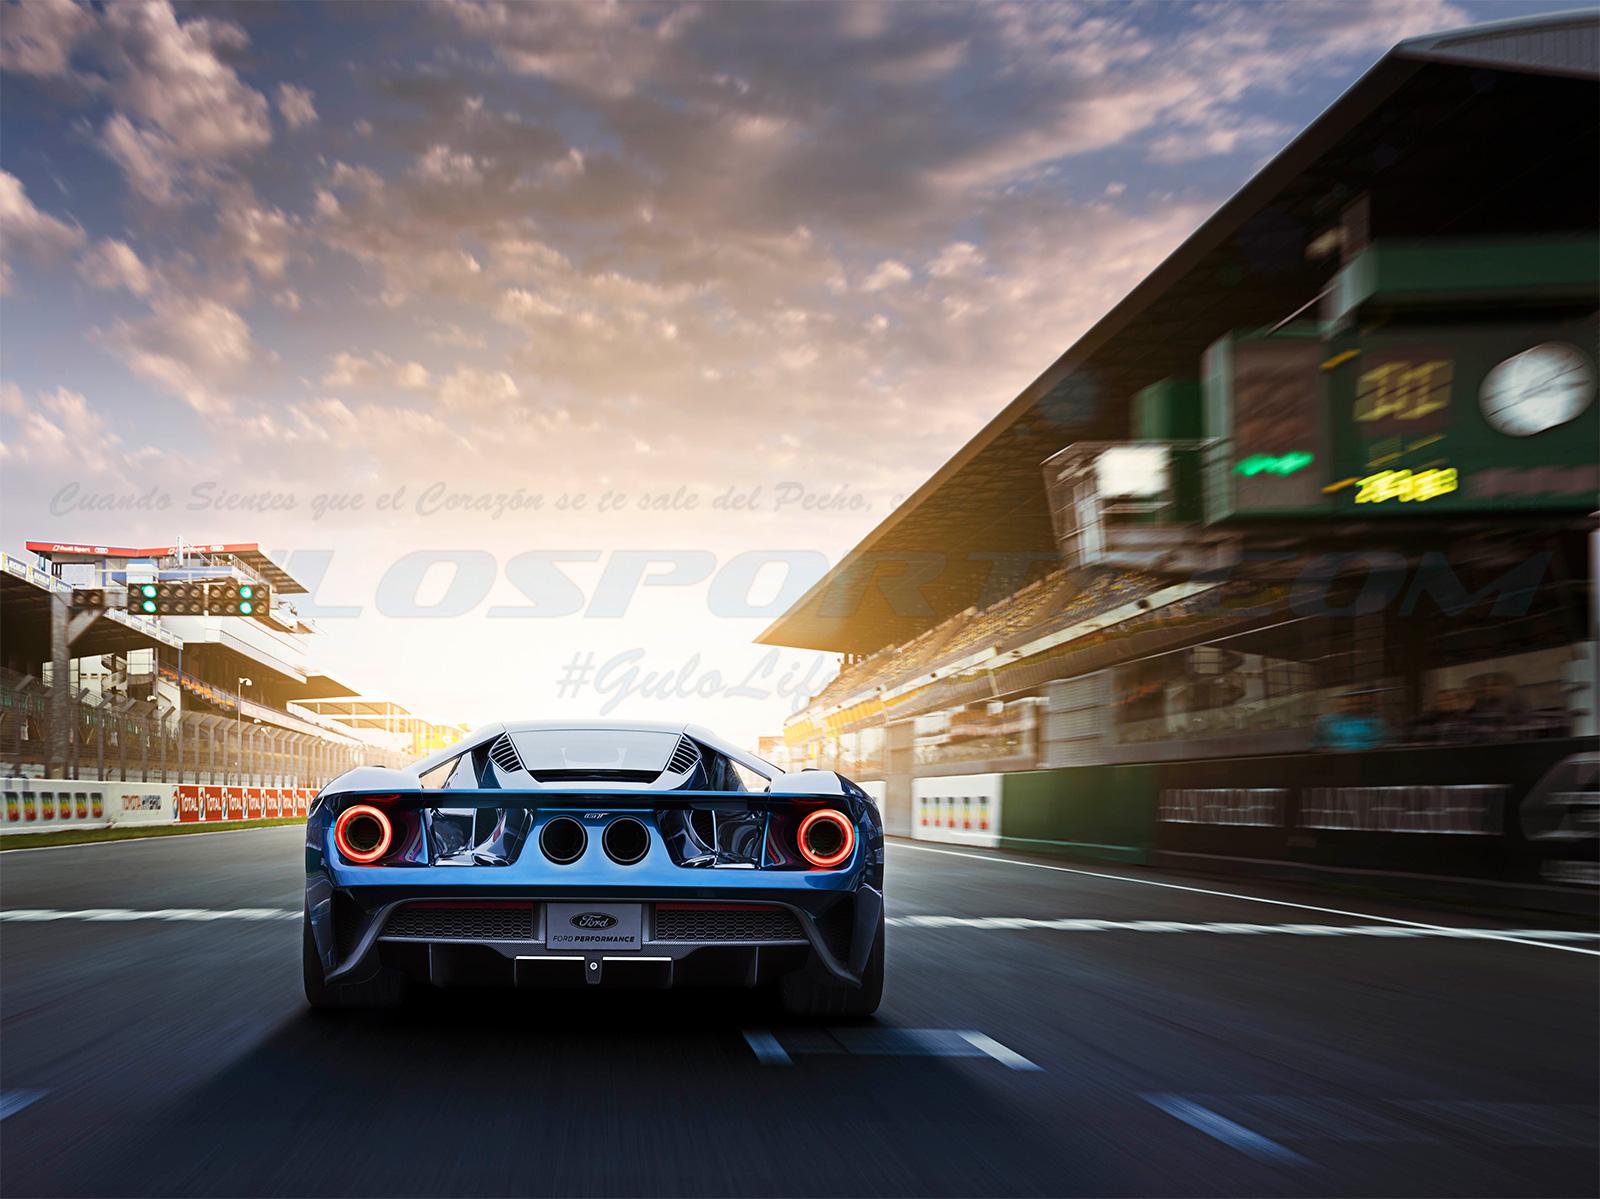 Ford GT 2016 España Gulosports